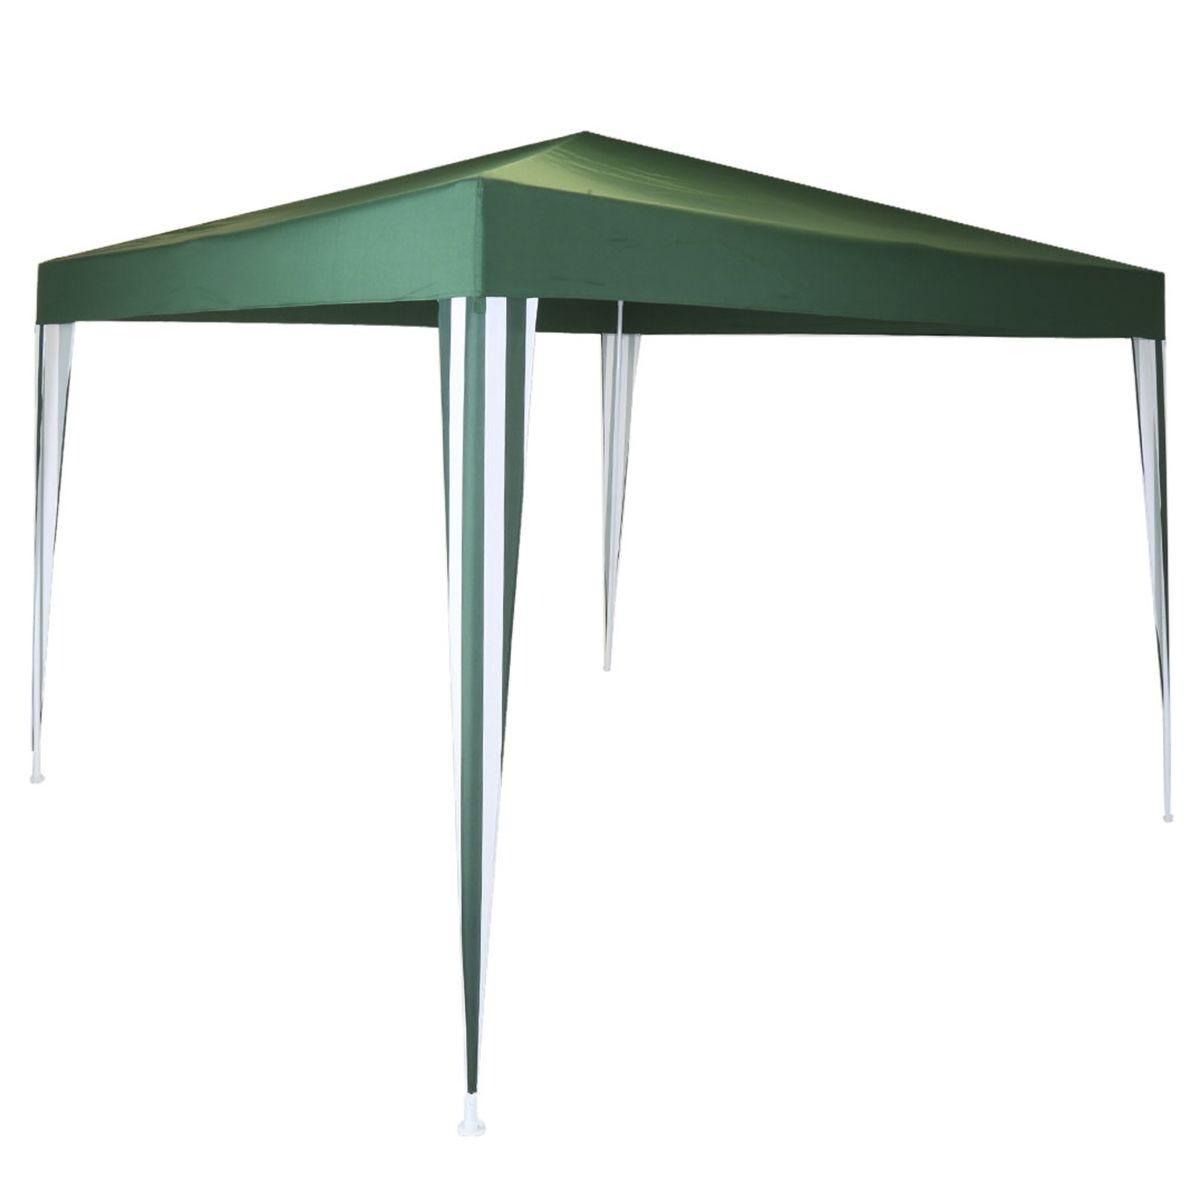 Charles Bentley 3 x 3m Polyester Gazebo - Green/Stripe